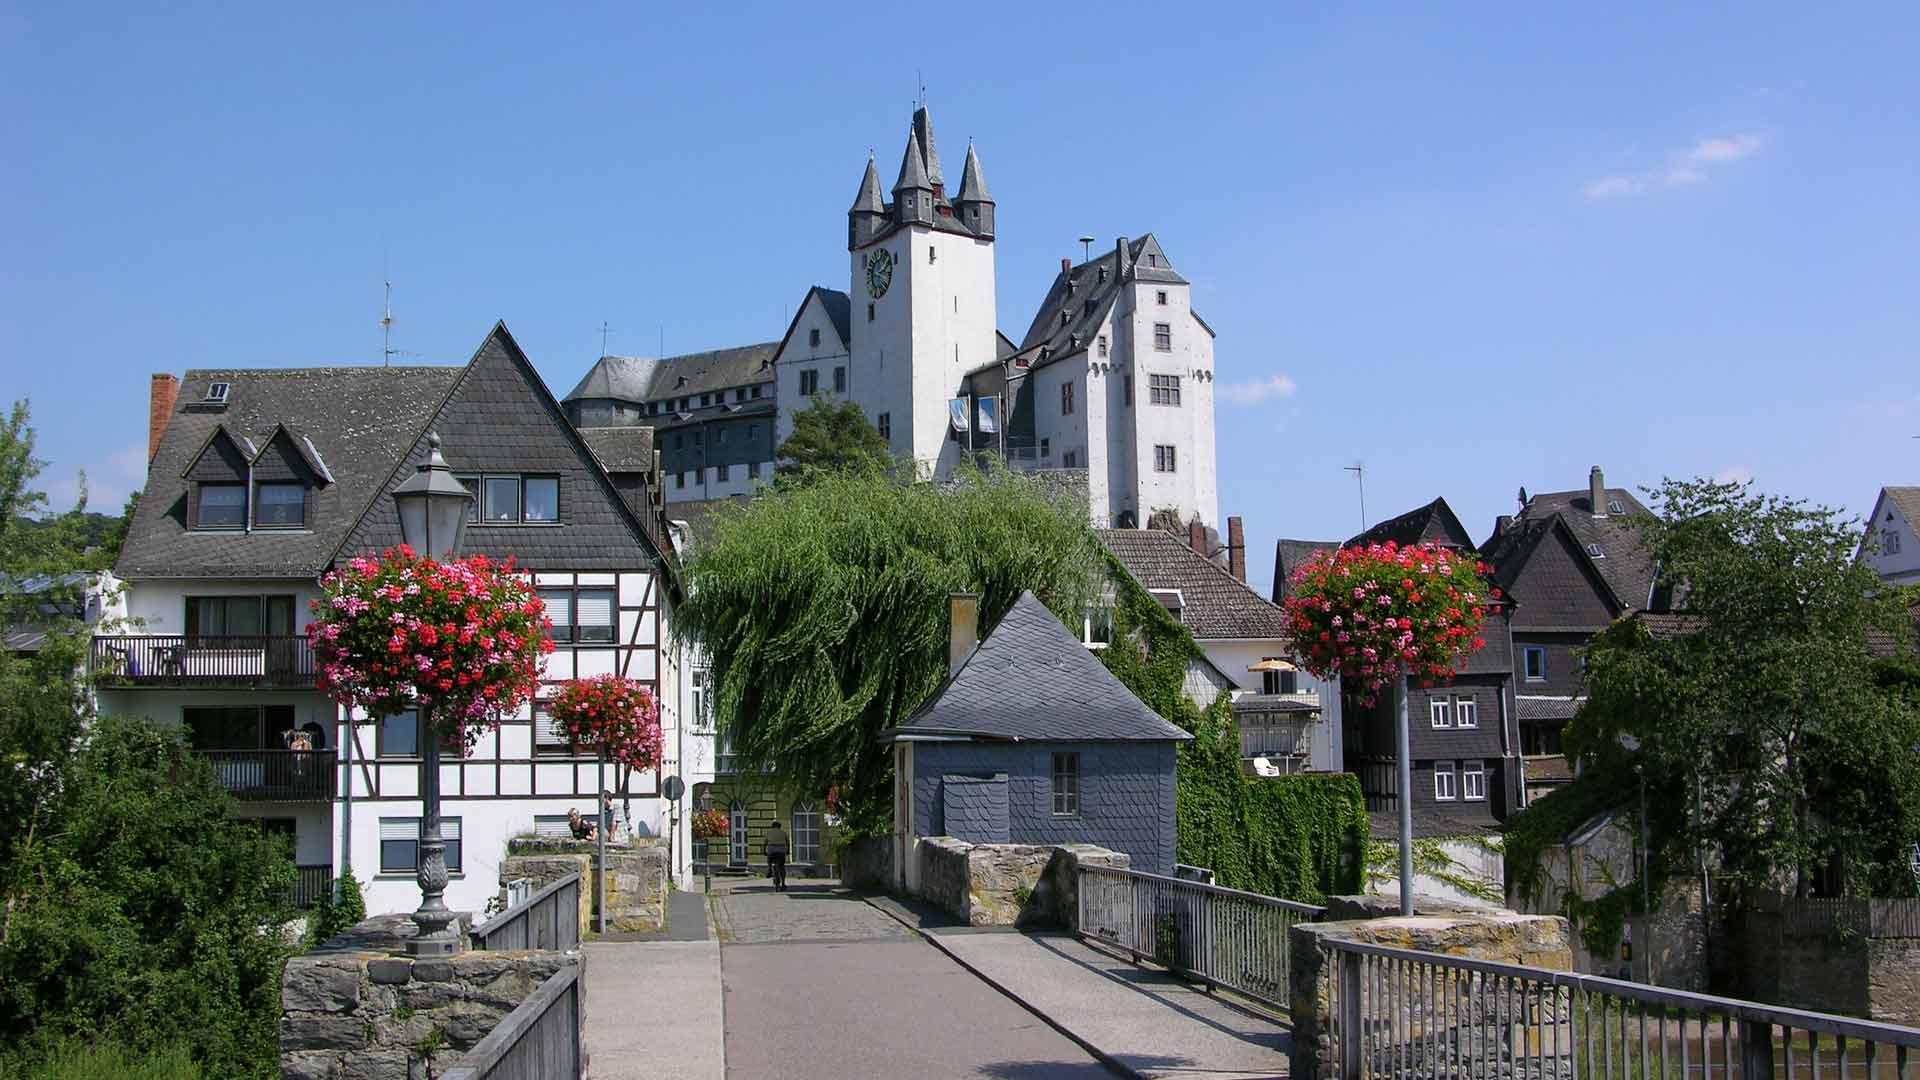 Schloss Grafenstein in Diez aan de Lahn.